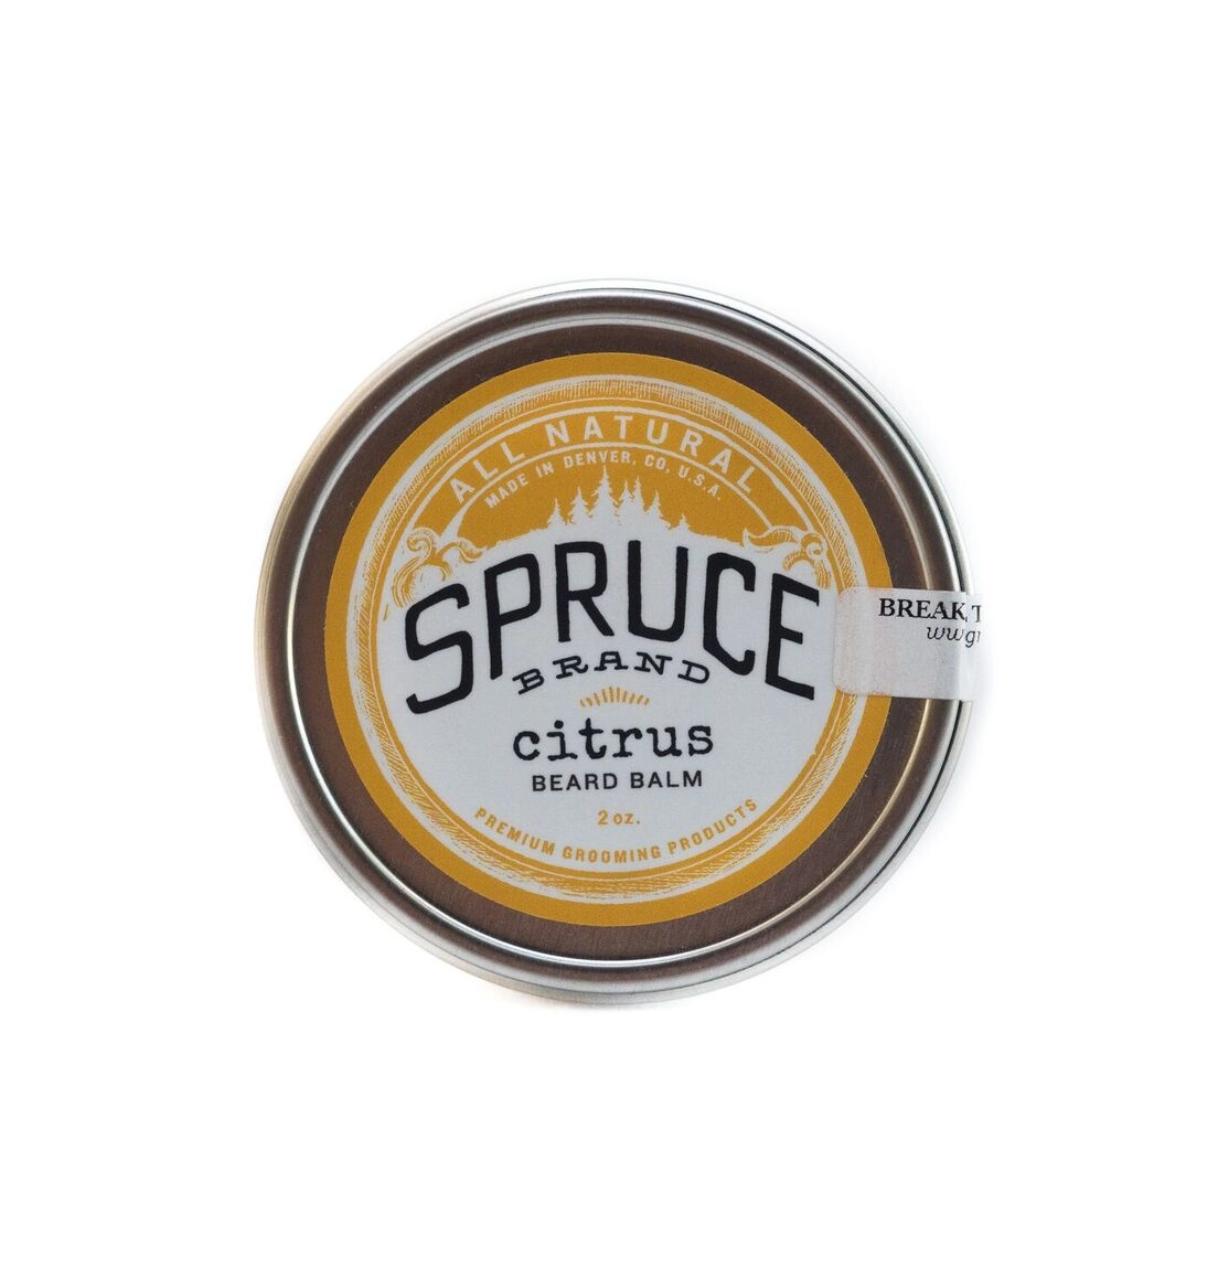 Spruce Beard Collection Citrus Beard Balm